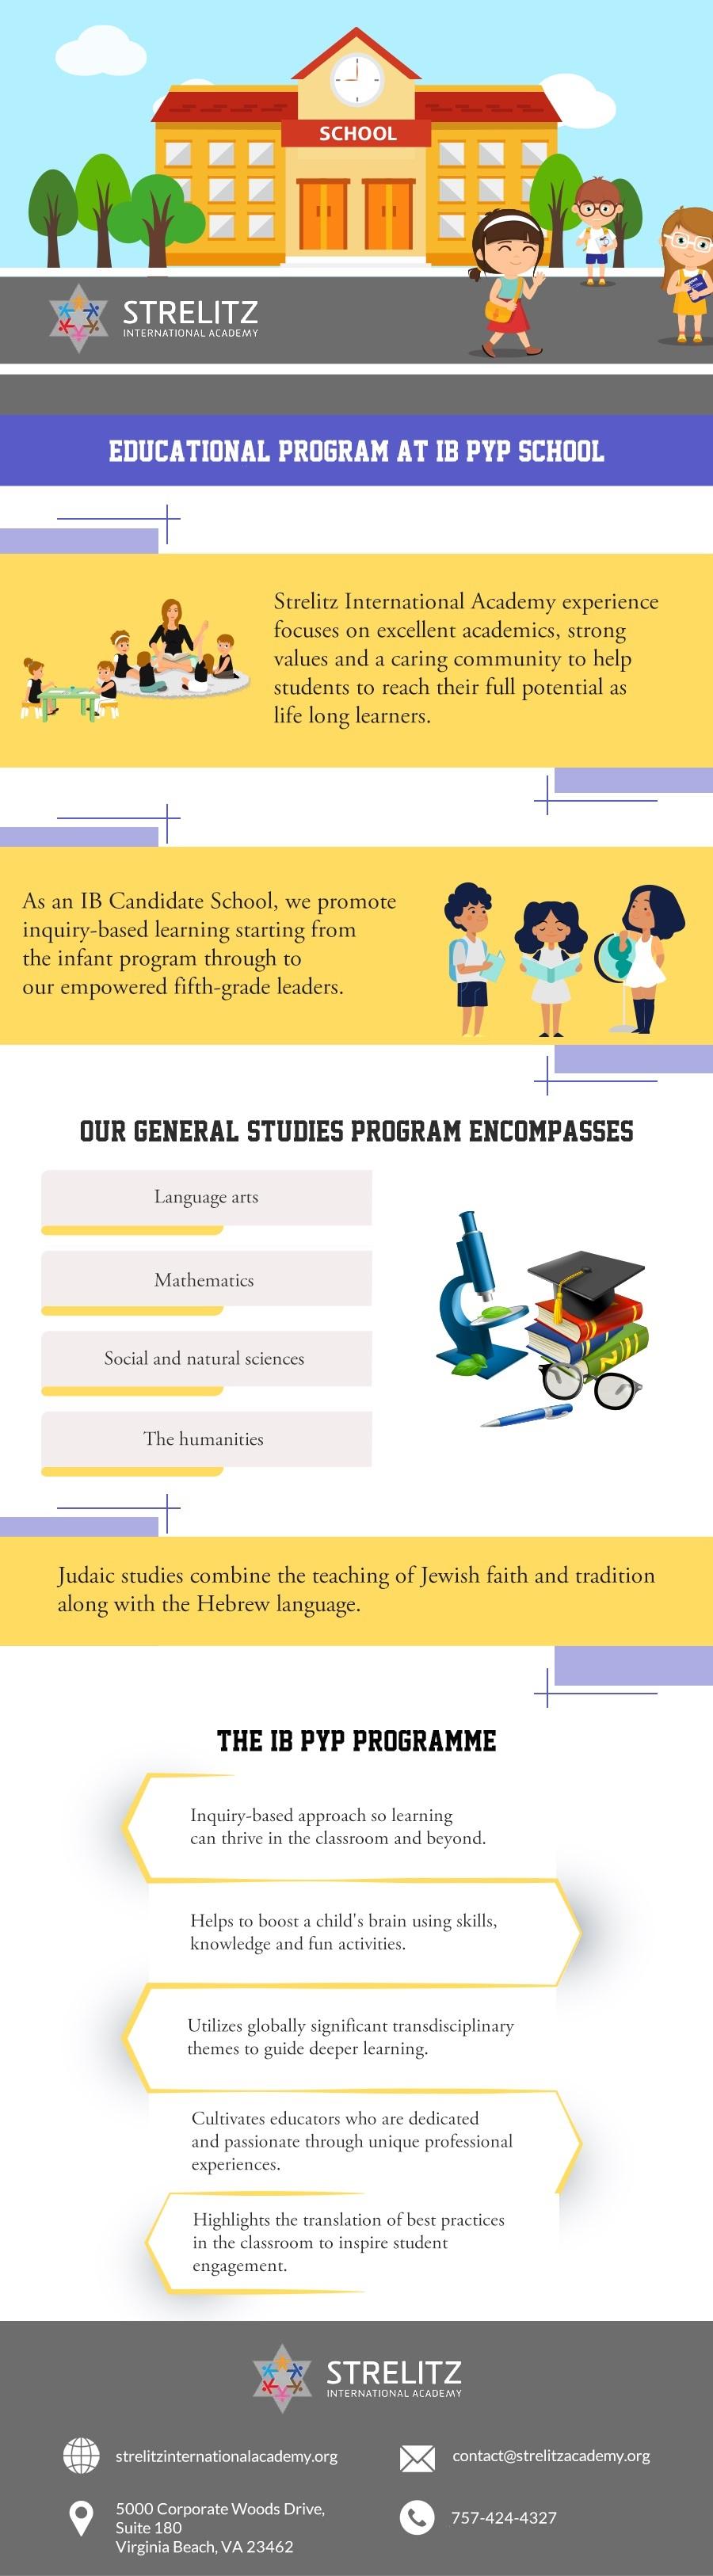 : Educational-Program-at-IB-PYP-School.jpg